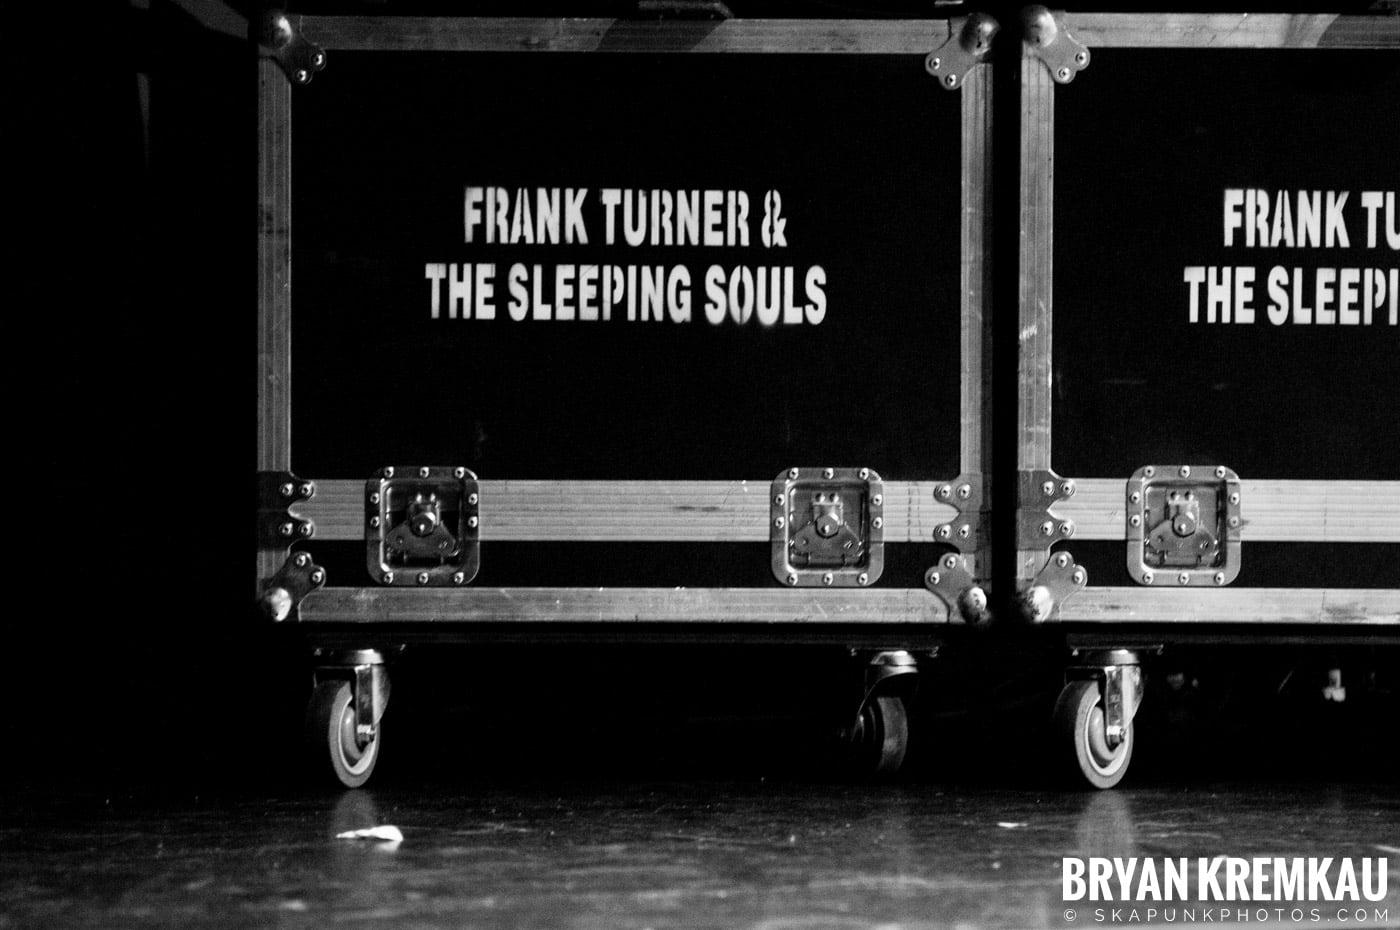 Frank Turner & The Sleeping Souls @ Webster Hall, NYC - 9.29.12 (22)